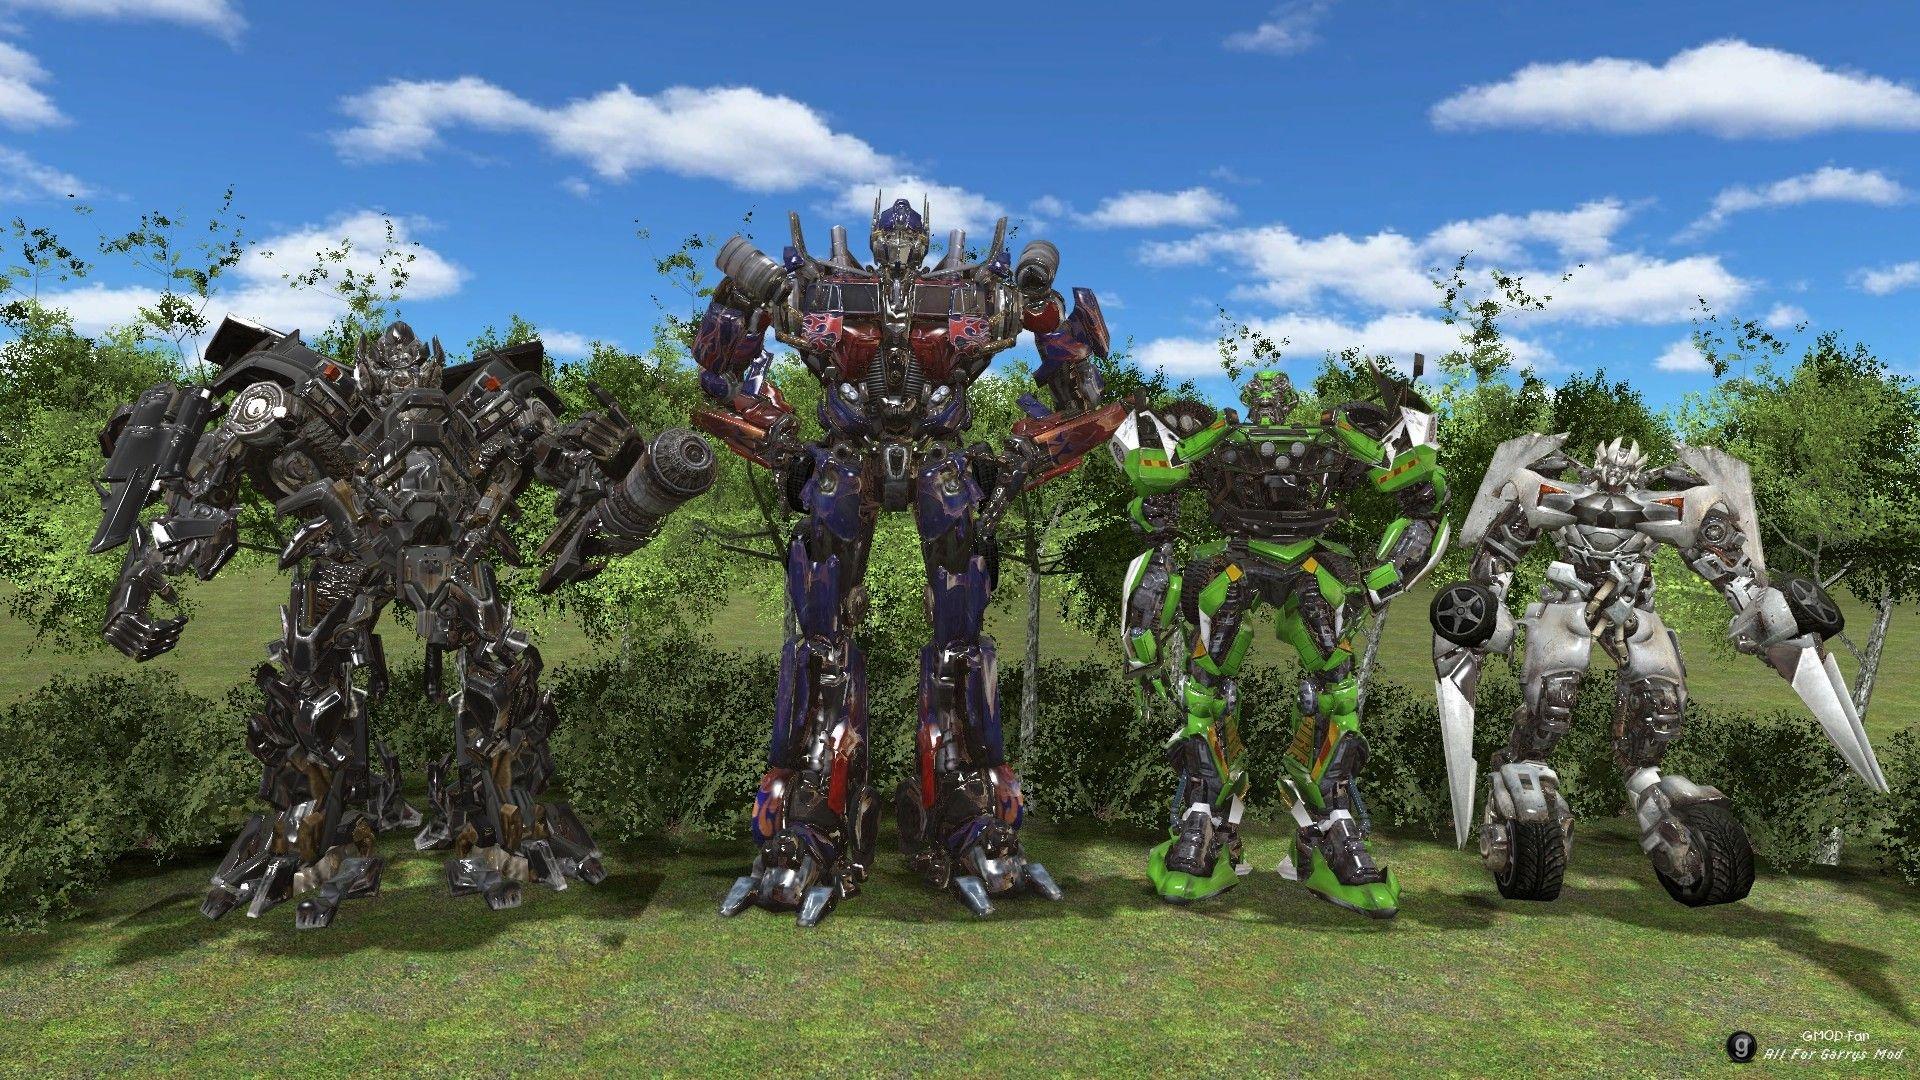 transformers prime игра скачать торрент на pc